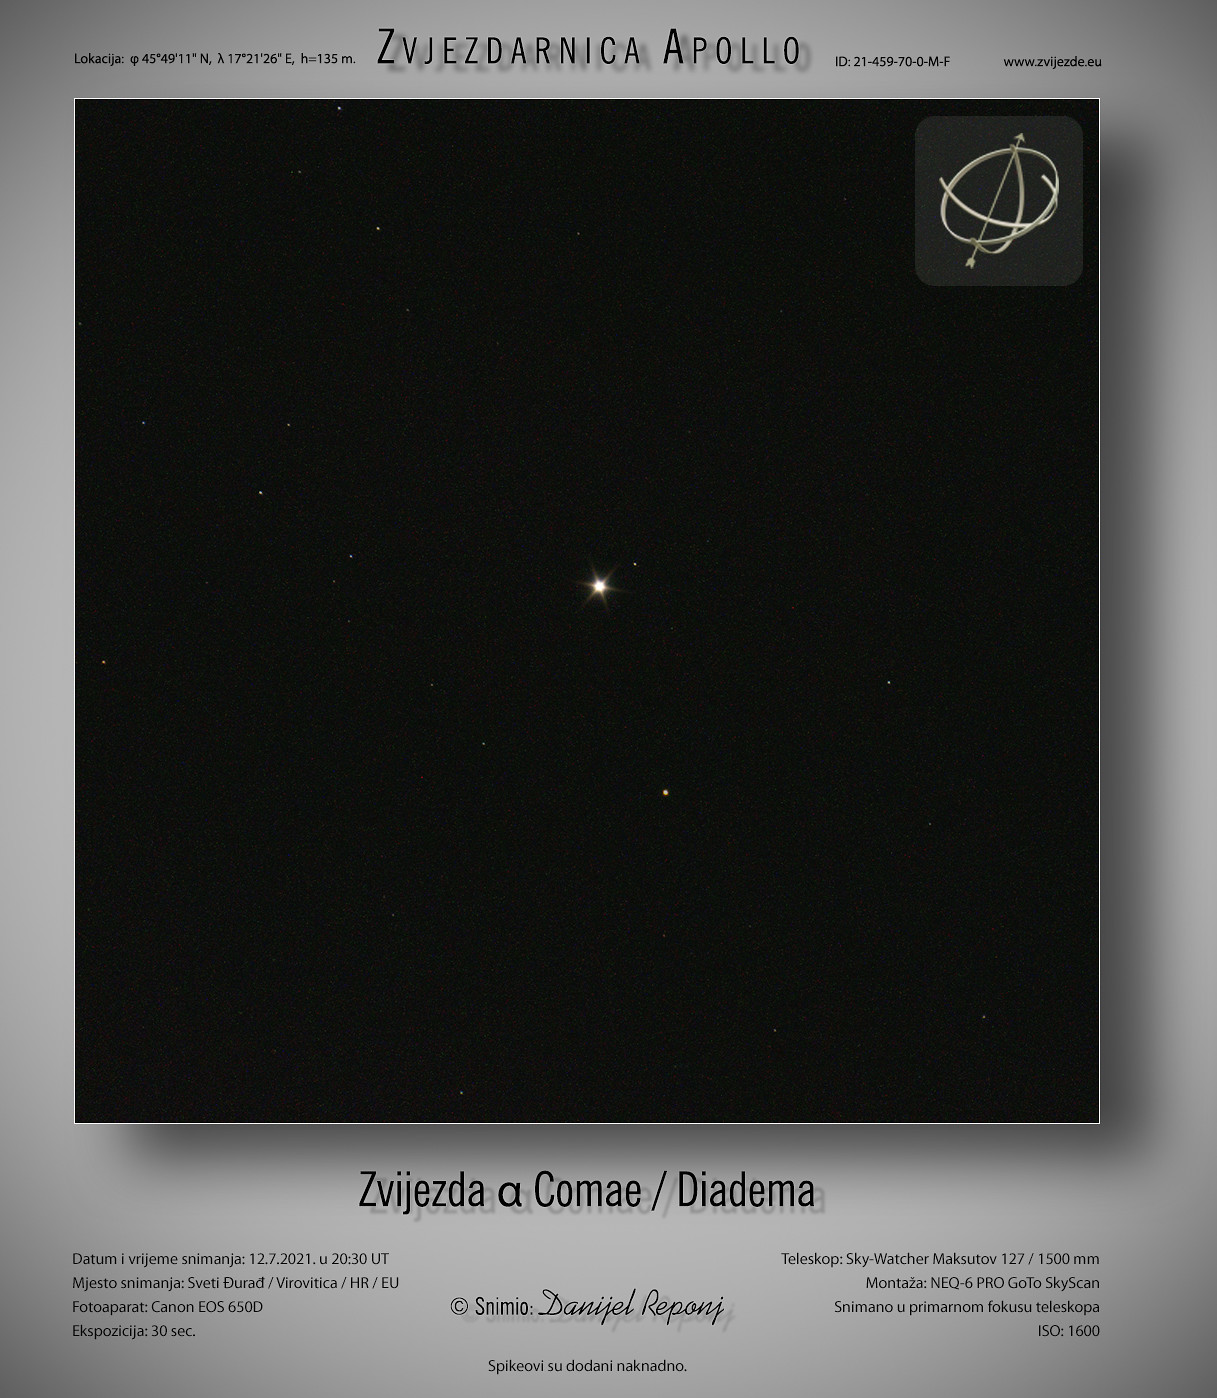 Alfa Berenikine kose - Diadema, 12.7.2021.